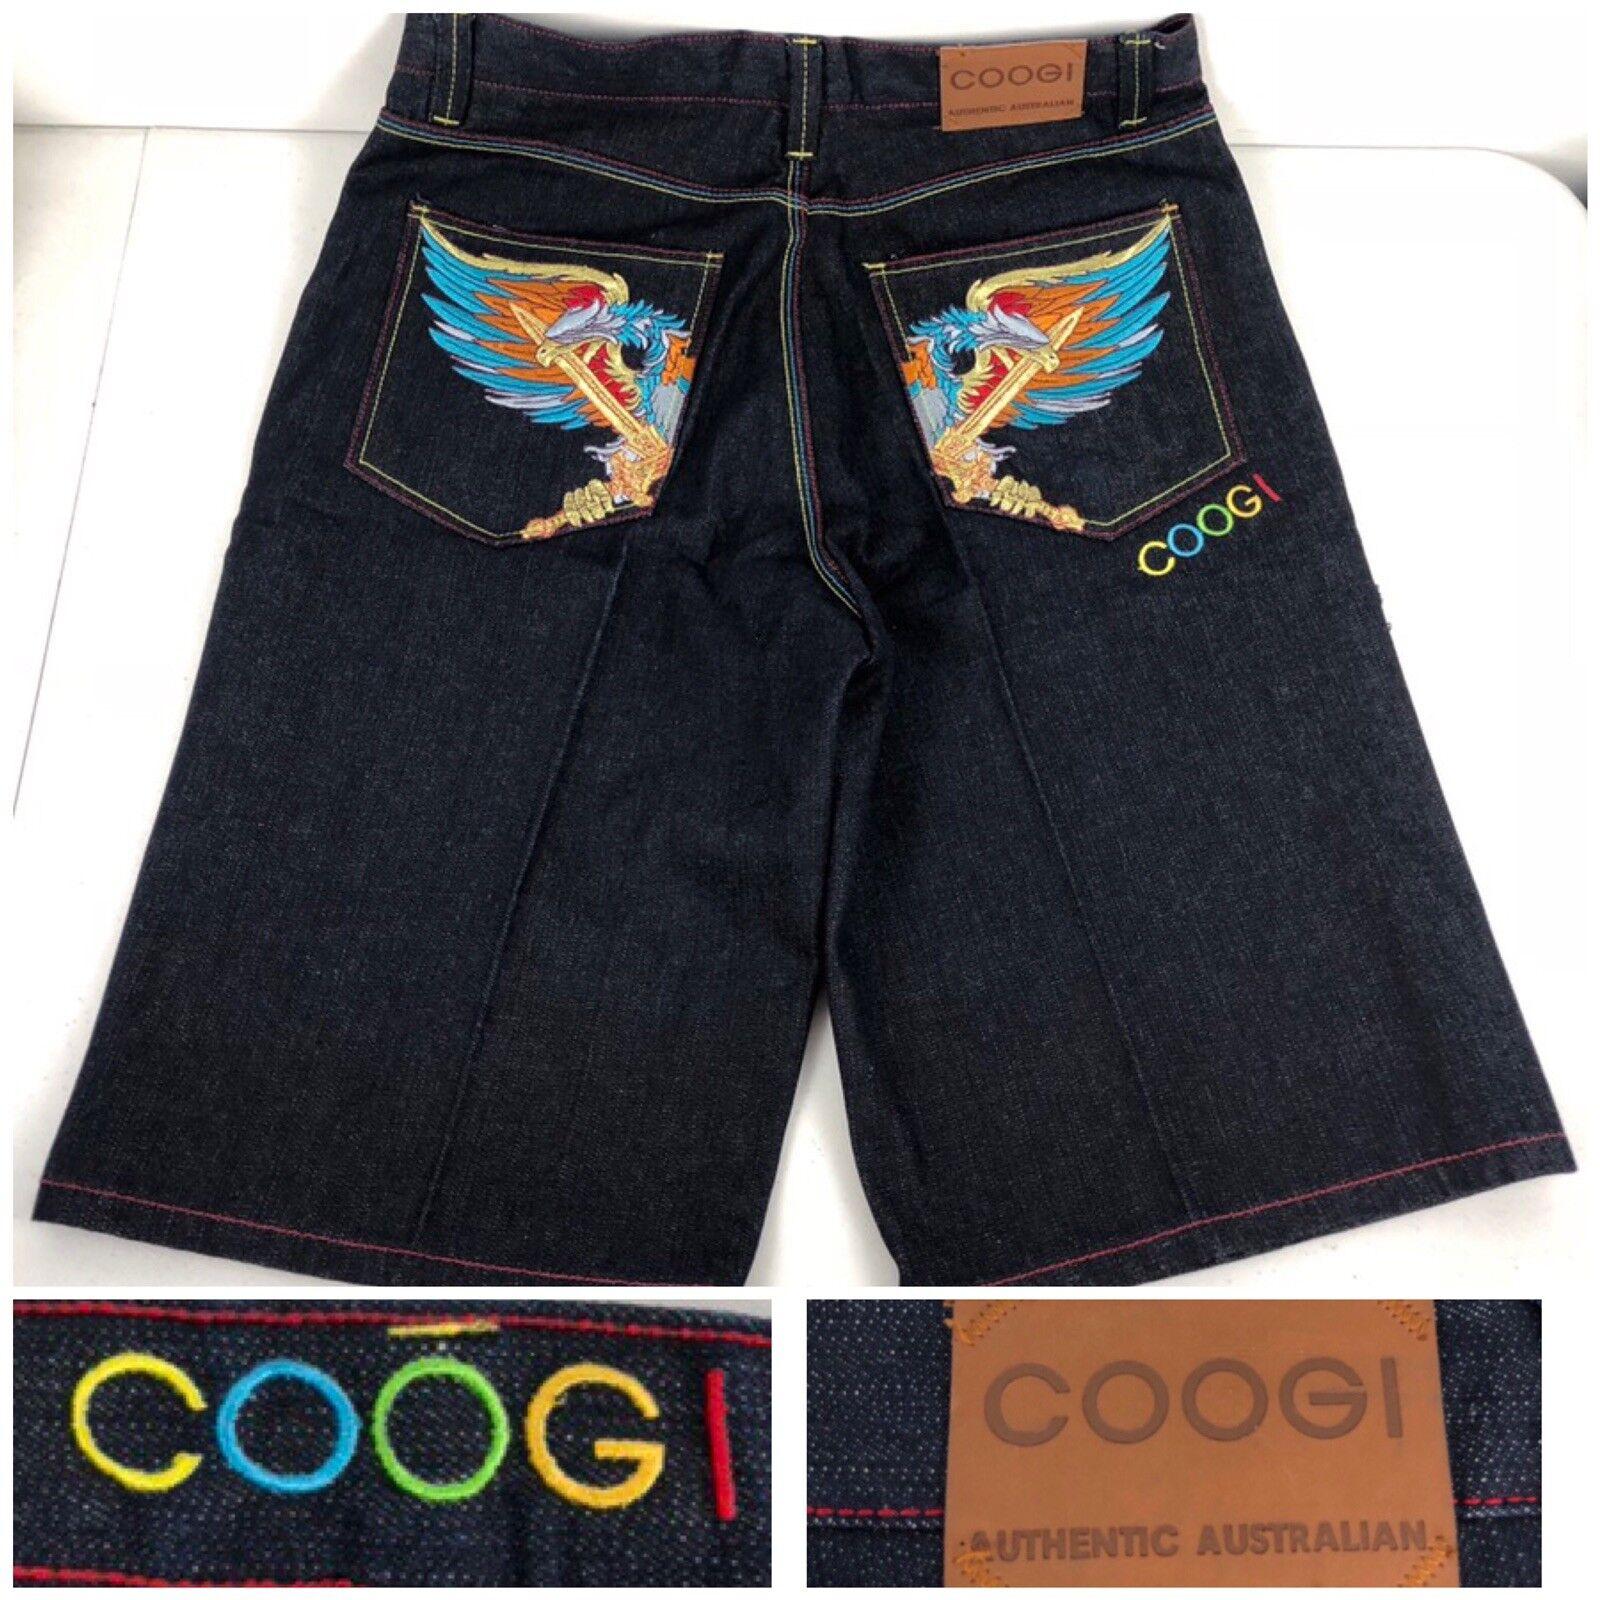 Coogi Mens 36 X 14 Denim Shorts Embroidered Multicolor EUC